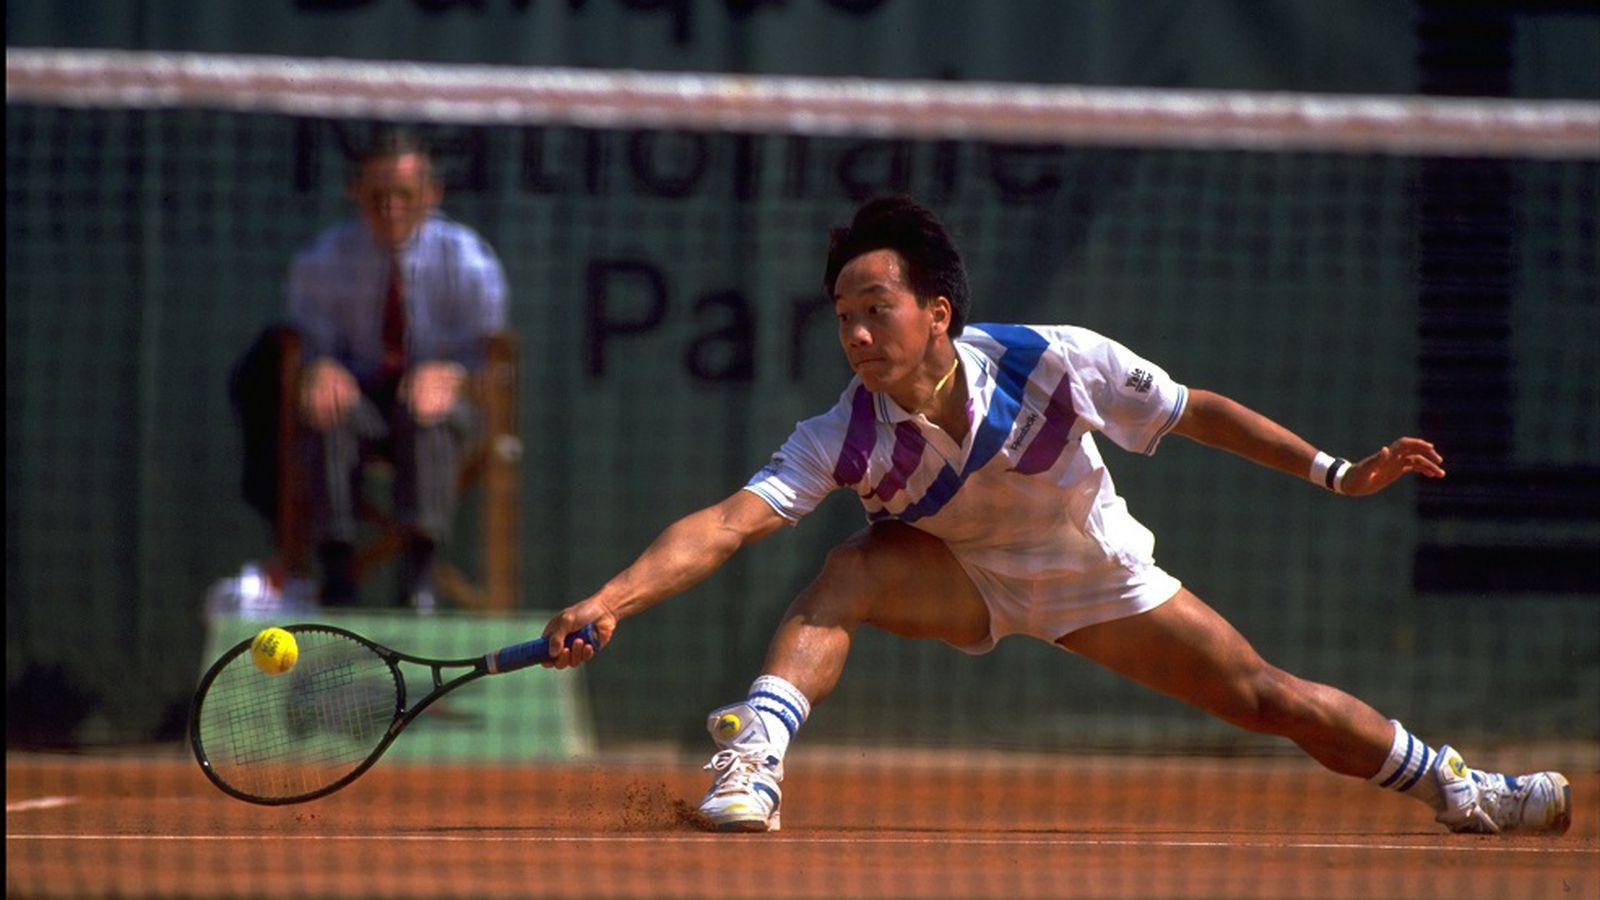 michael chang racquet